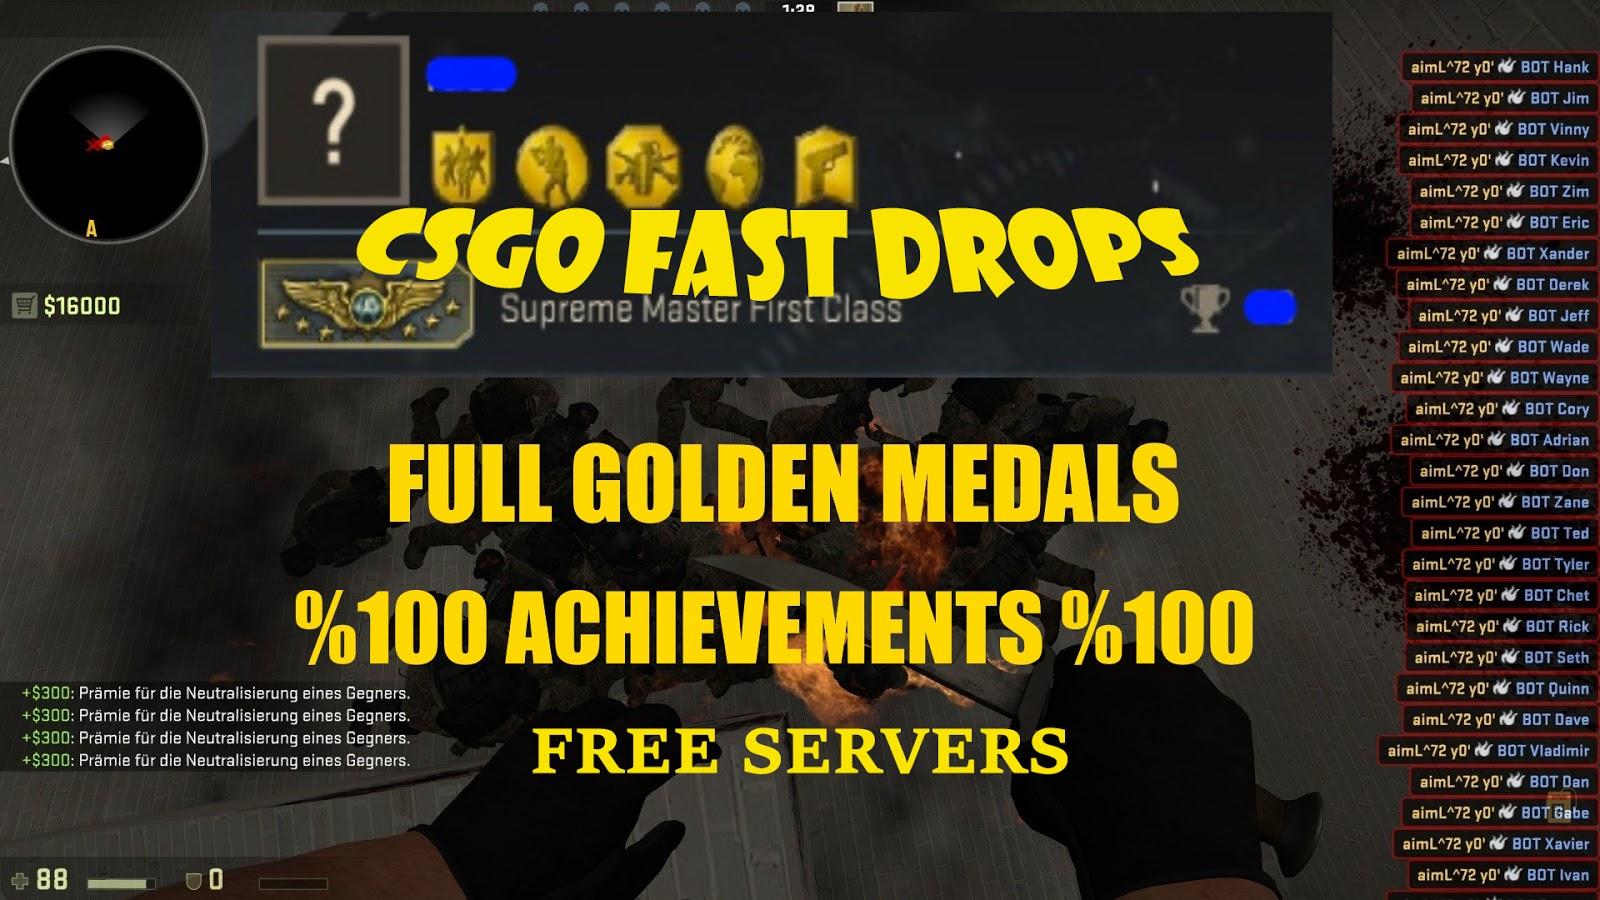 Cs go fast map achievements your steam trade url как узнать кс го